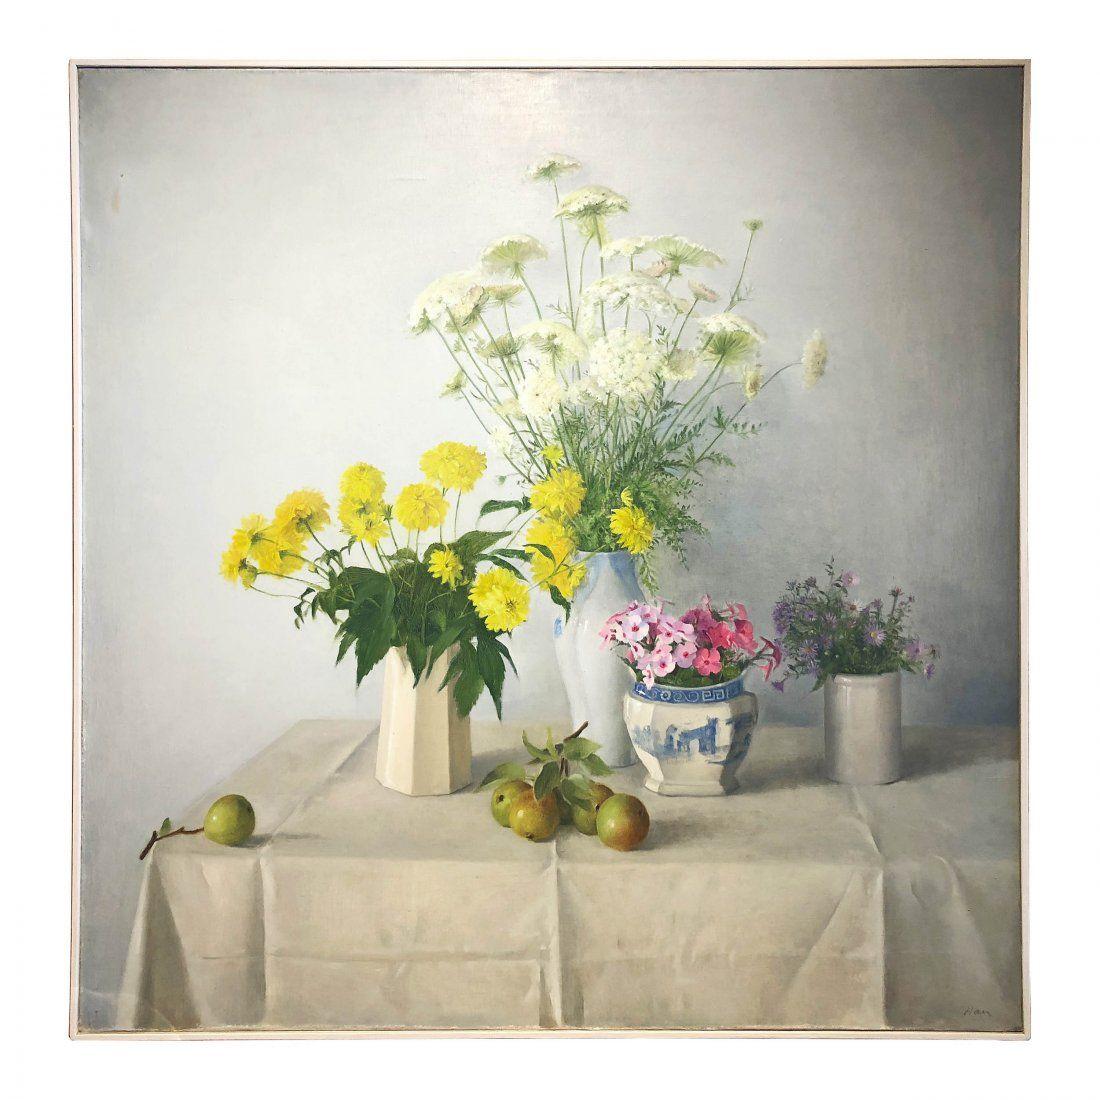 Original Oil Painting on Canvas by Raymond Han